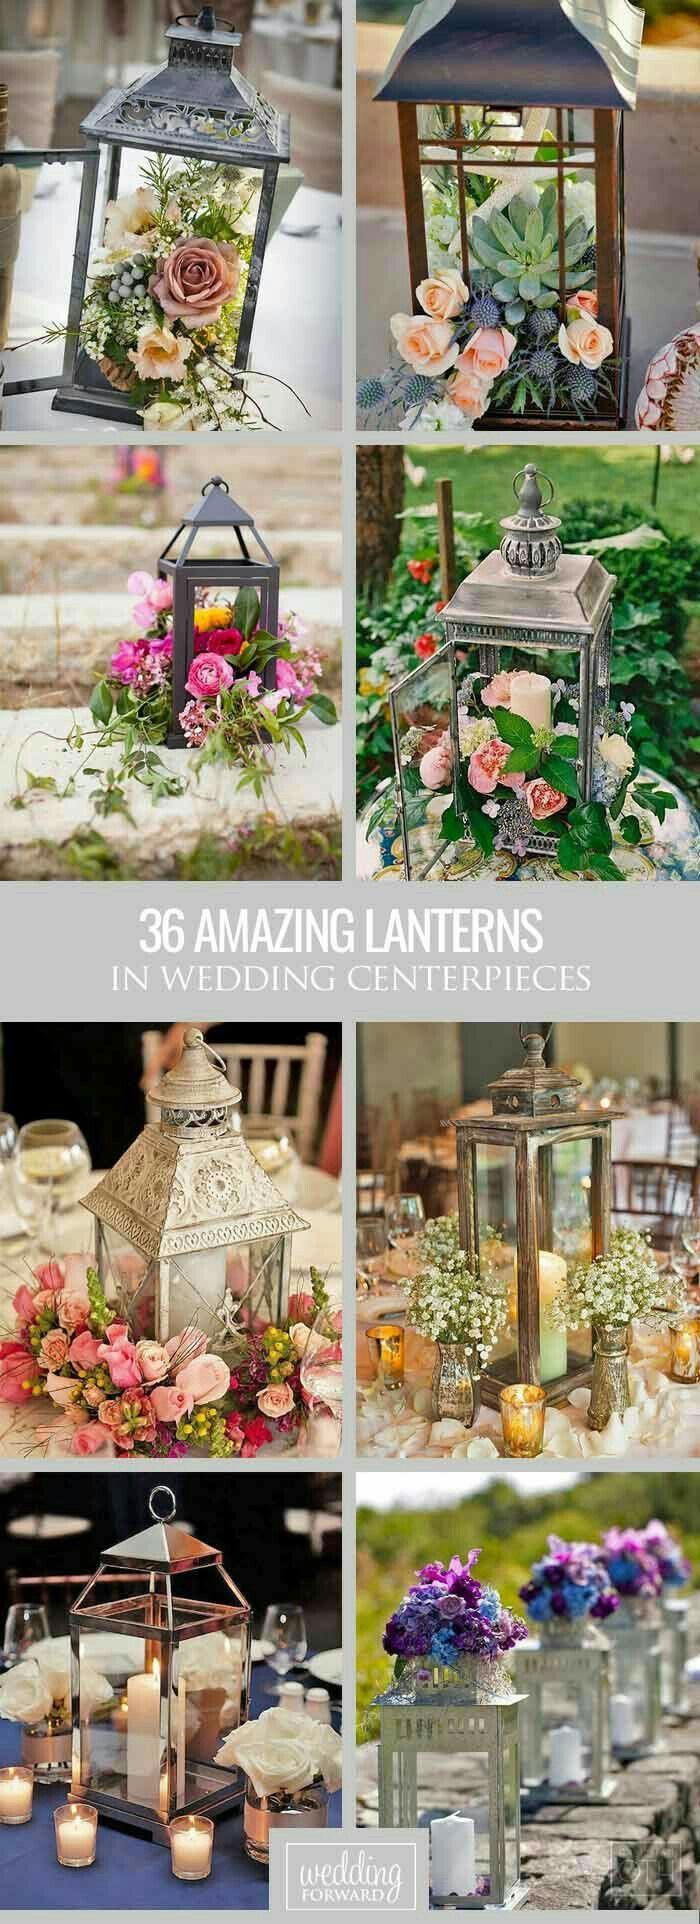 Decorating With Burlap 1642 Best Rustic Country Burlap Vintage Weddings Events Decor